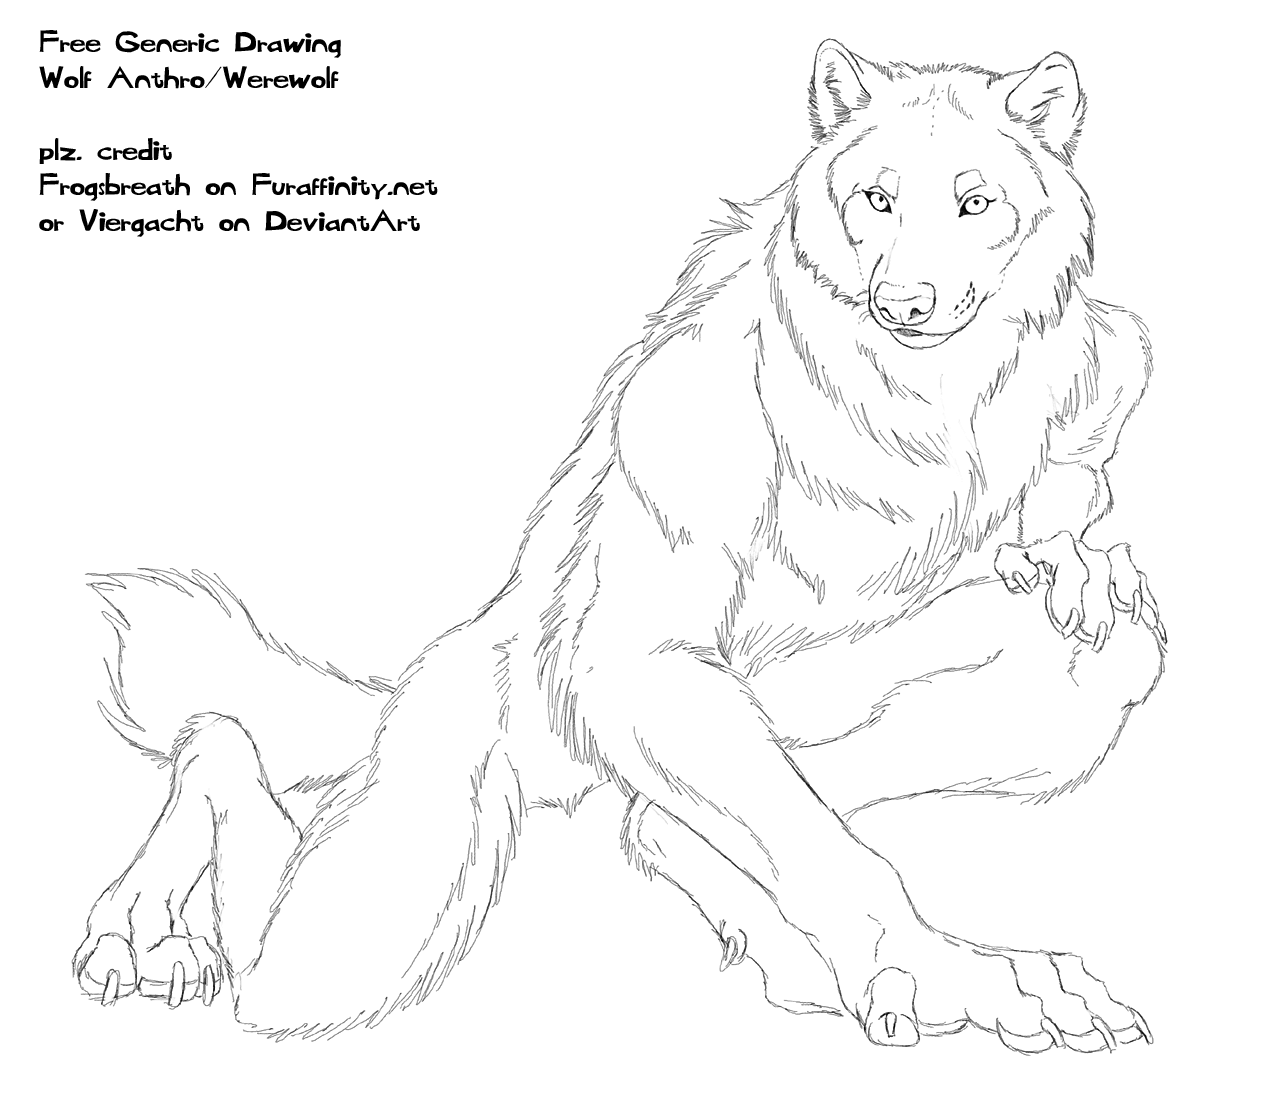 Drawn wolfman human love Free Wolf Viergacht on Drawing